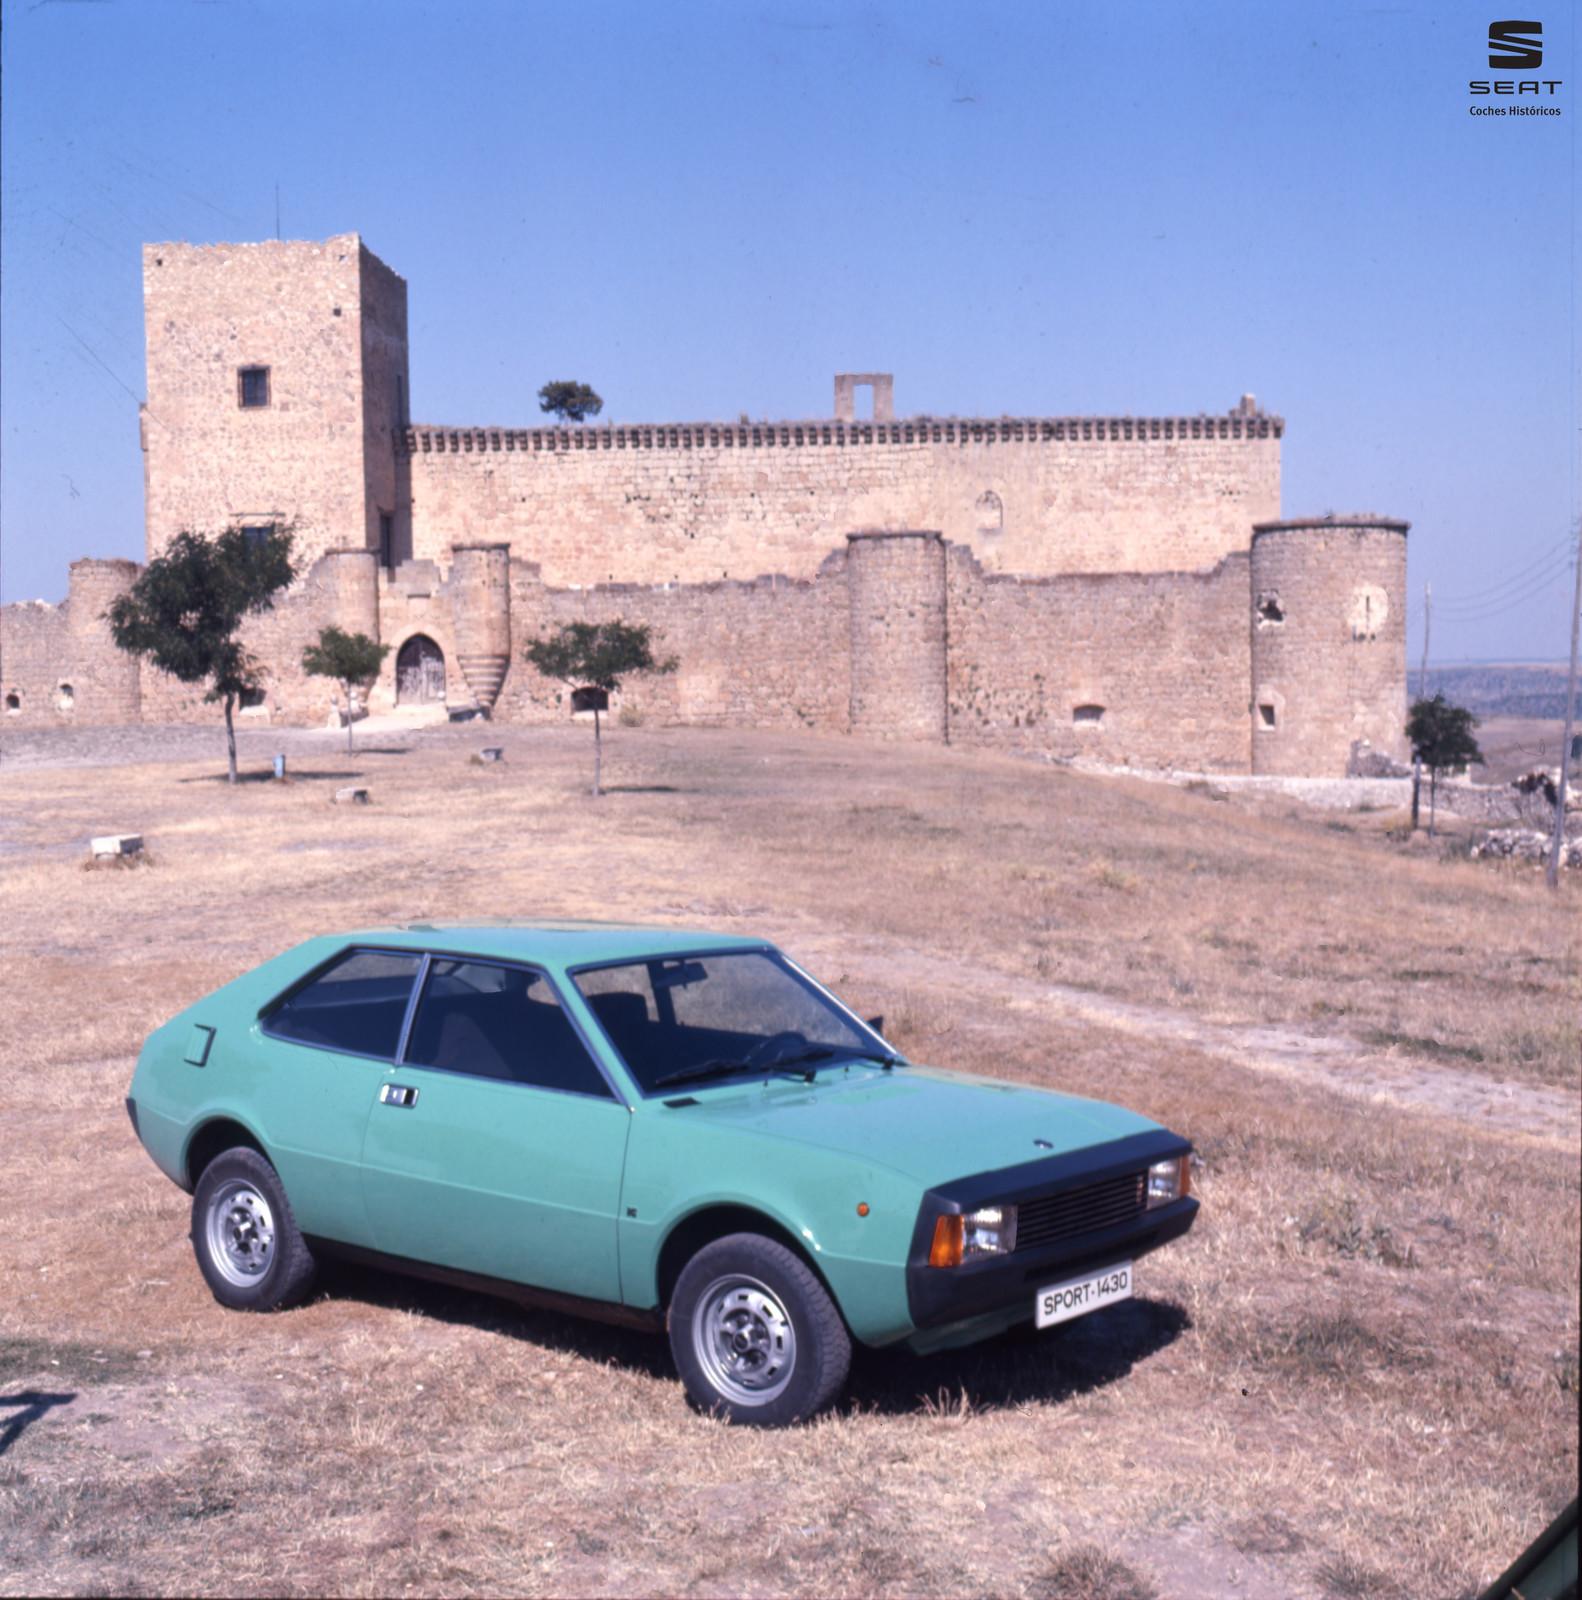 Foto de Motor SEAT 1430 - fotos históricas (29/49)